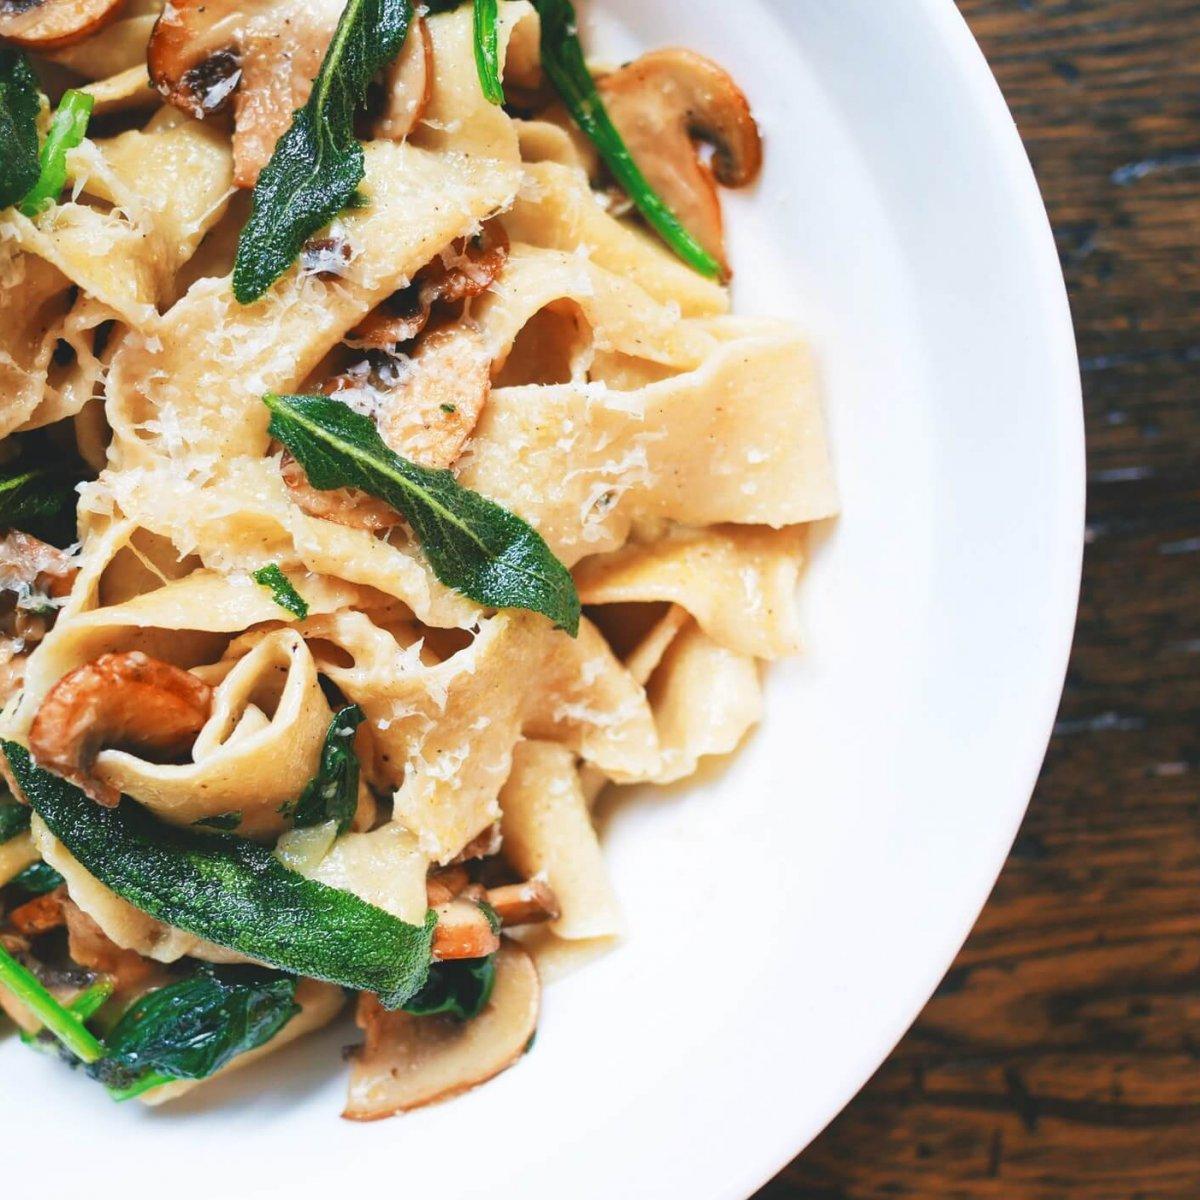 italian pasta 1 - National Restaurant Properties